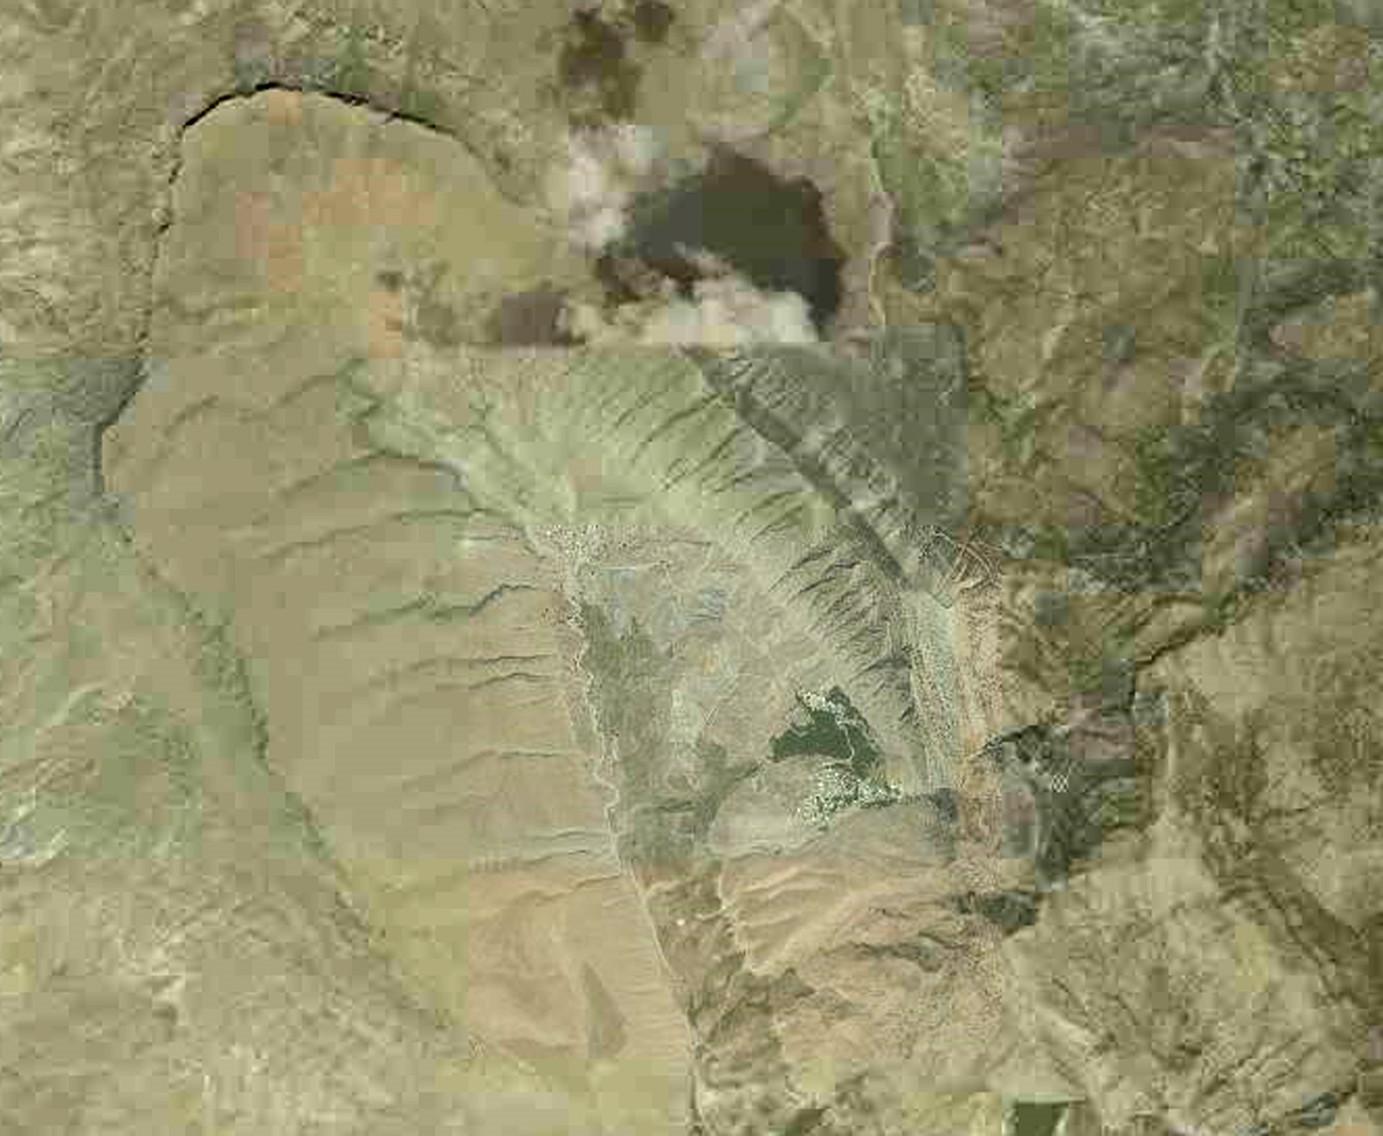 http://zardeh.persiangig.com/image/zardeh/zardeh_google/zardeh%20google%2003.jpg